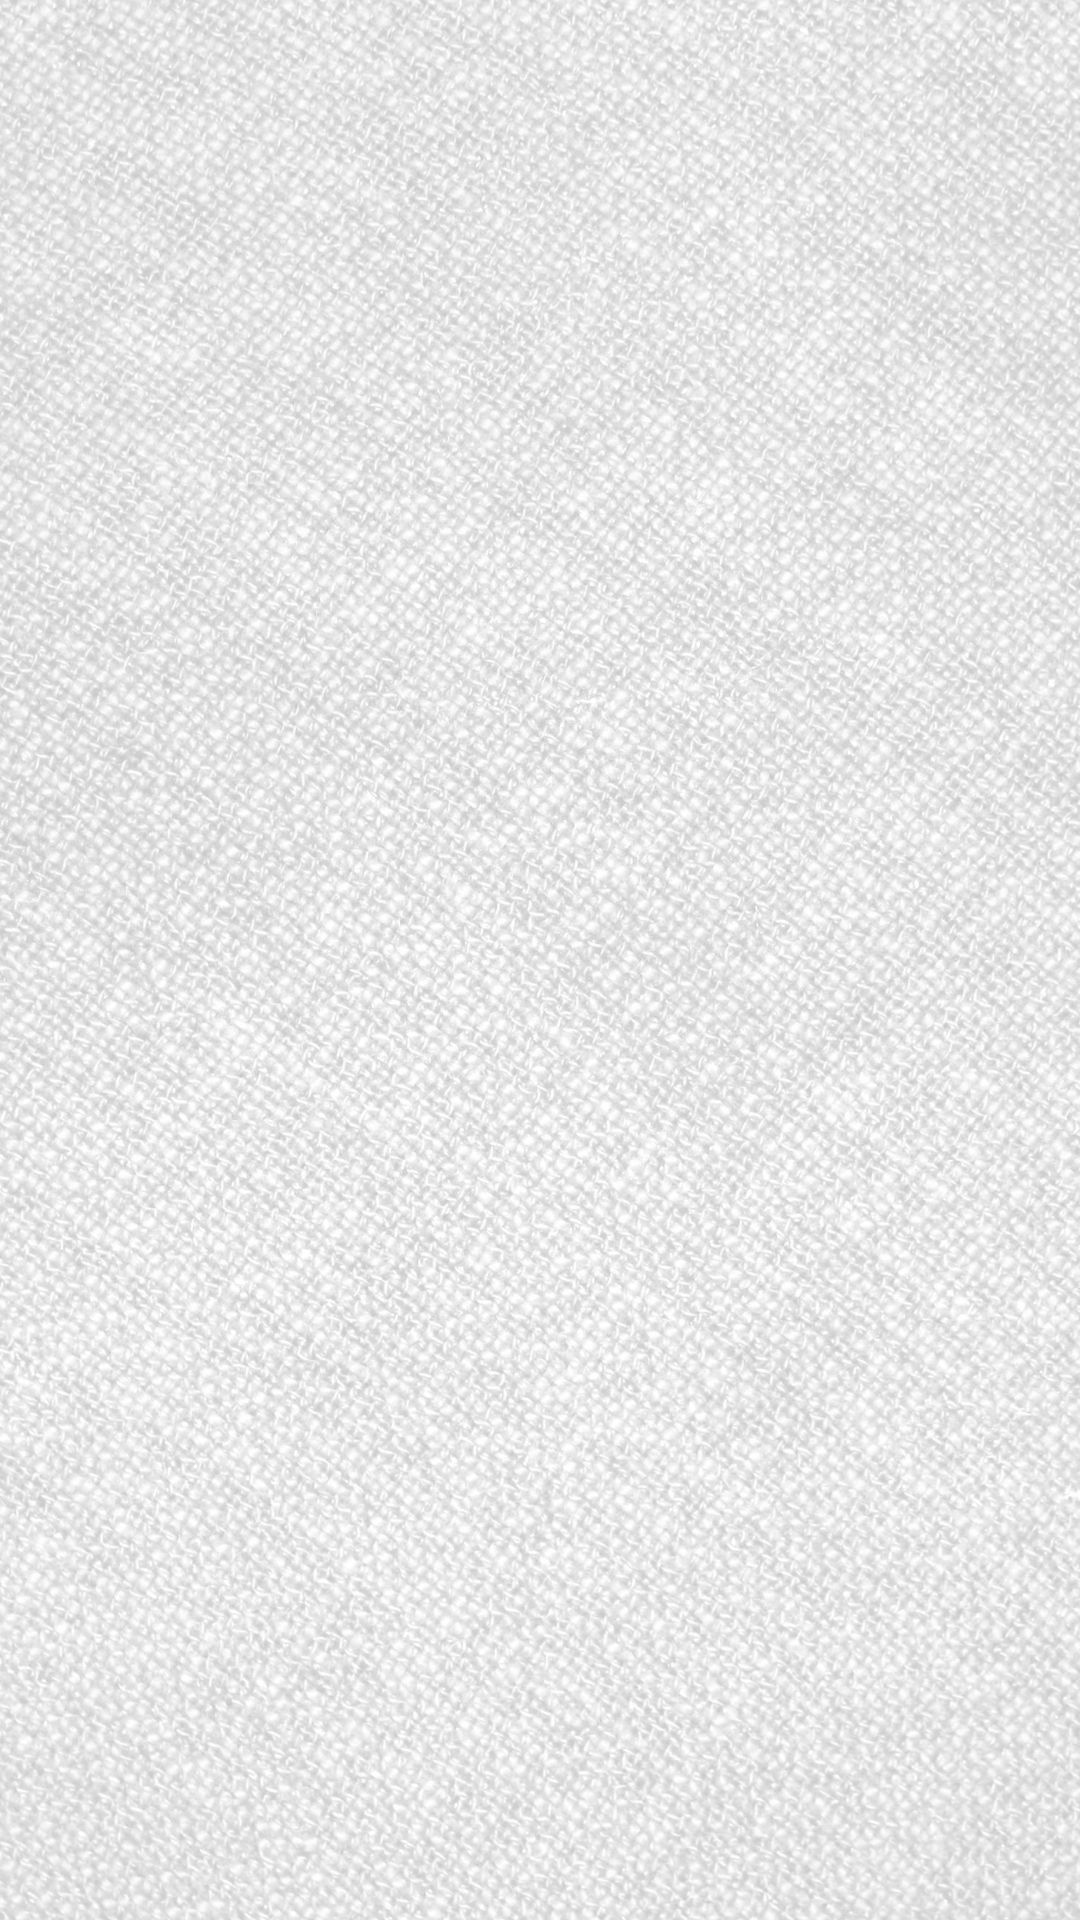 White XS Max wallpaper